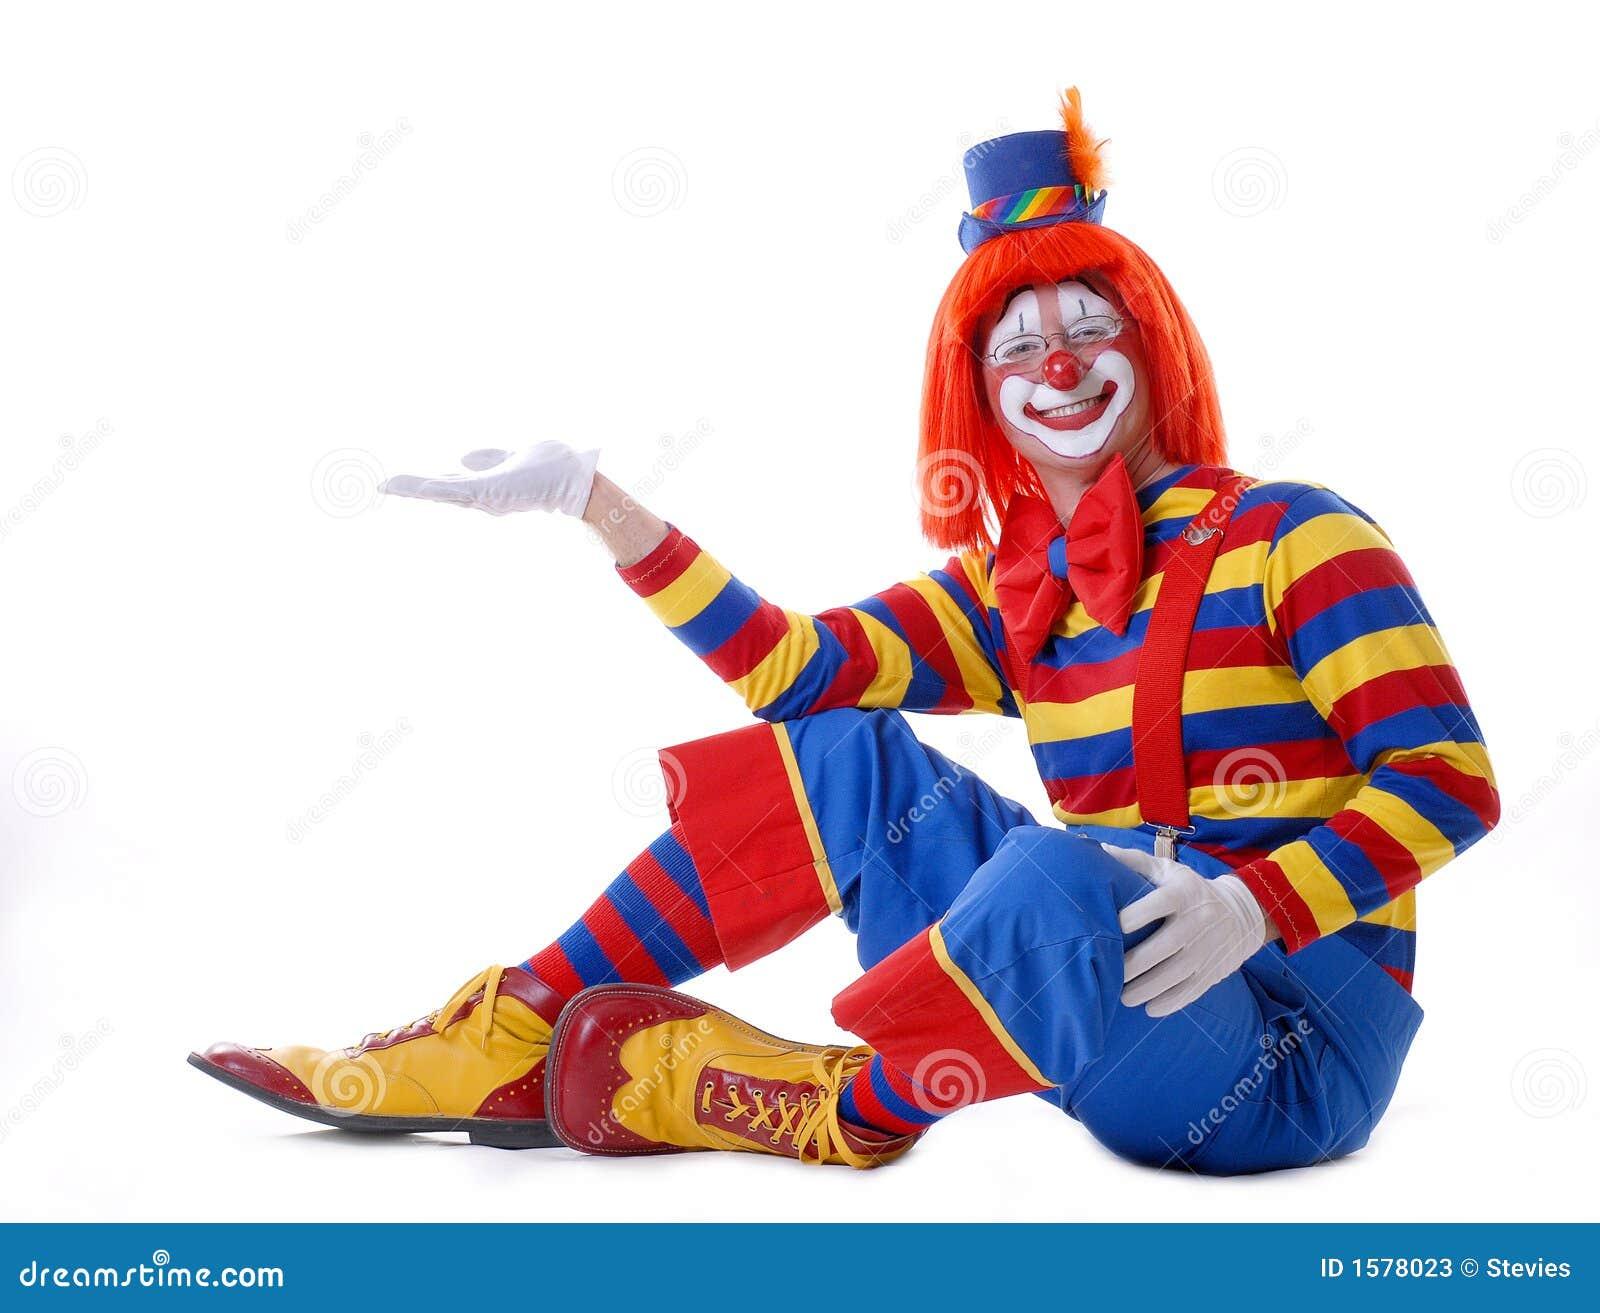 Circus Clown Stock Image Image Of Parties Birthday